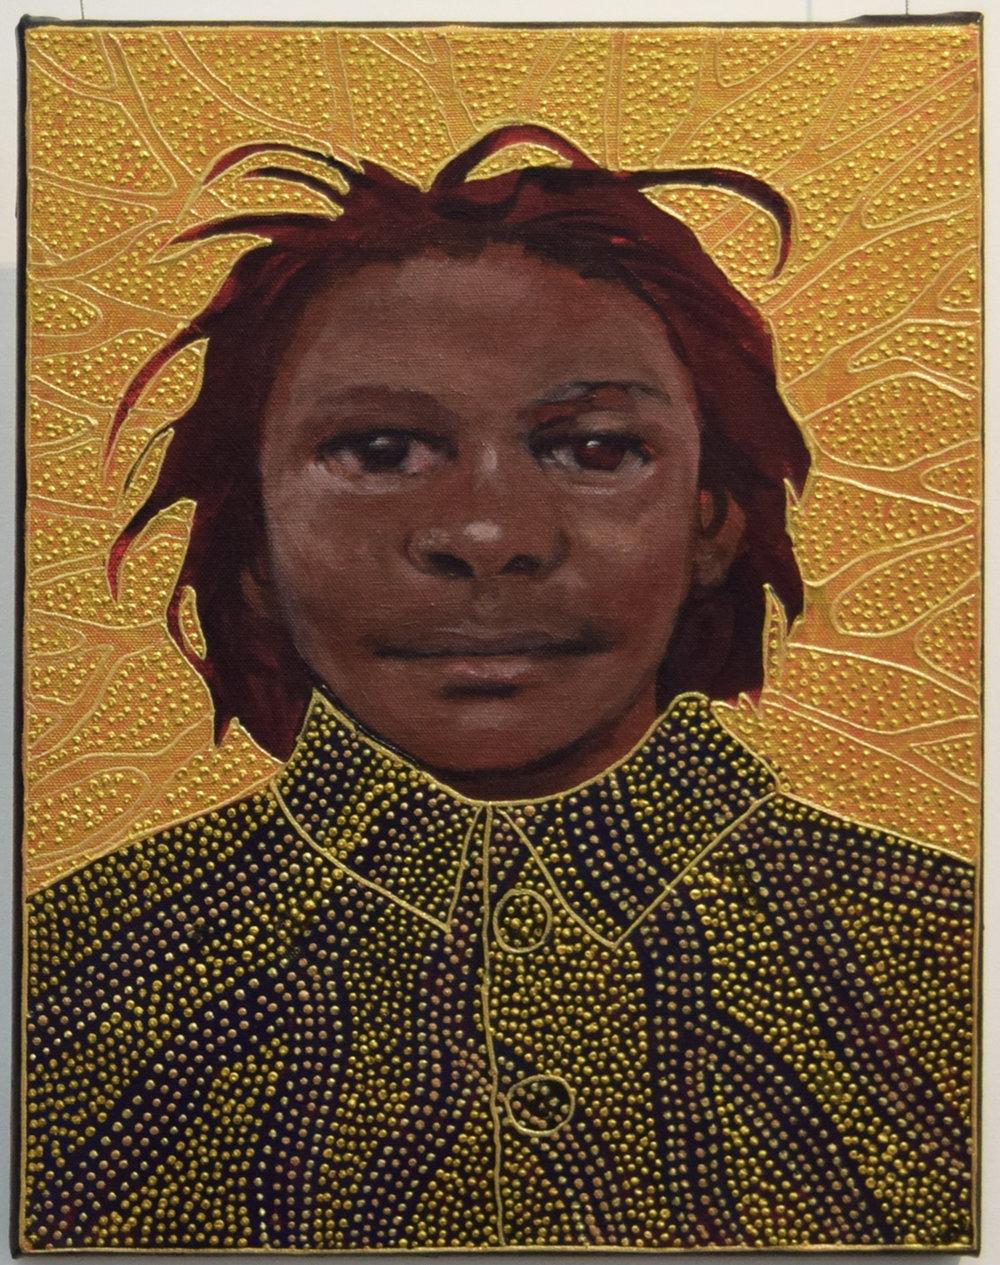 16. Julie Dowling, Gula-Gula (Very Close), 2018, acrylic, mica gold on canvas, 30 x 40 cm, $2,000